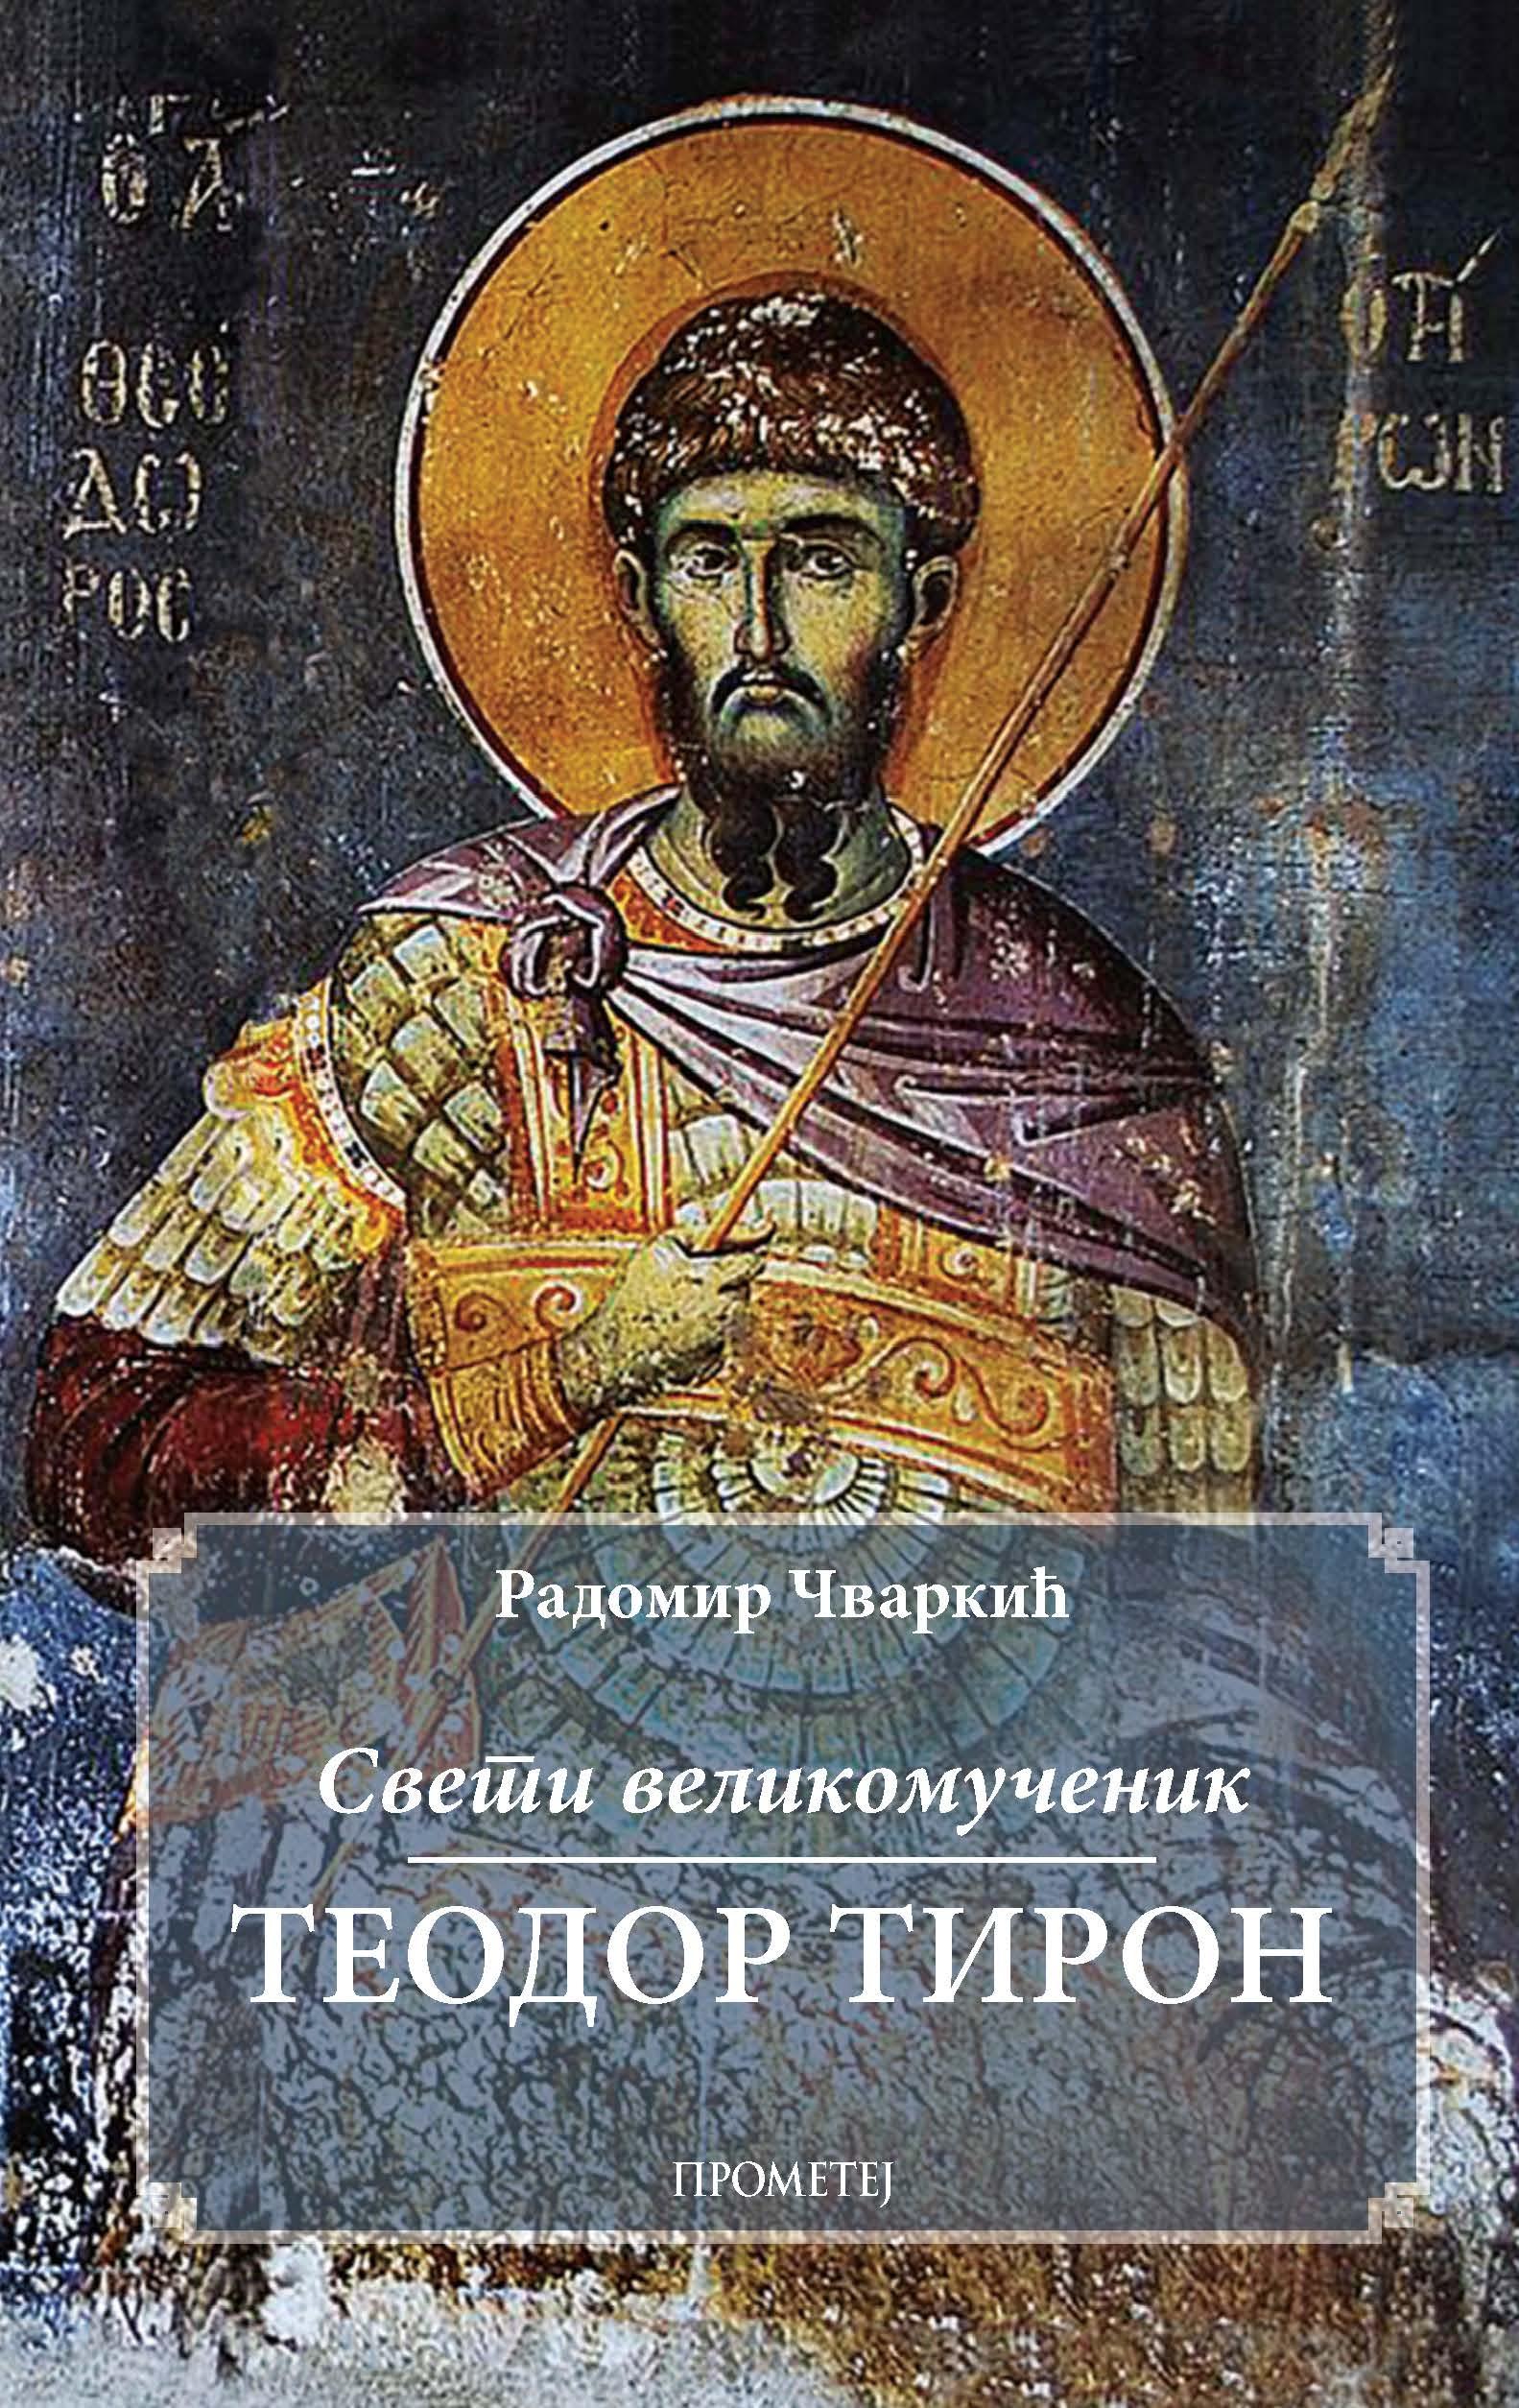 Sveti velikomučenik Teodor Tiron